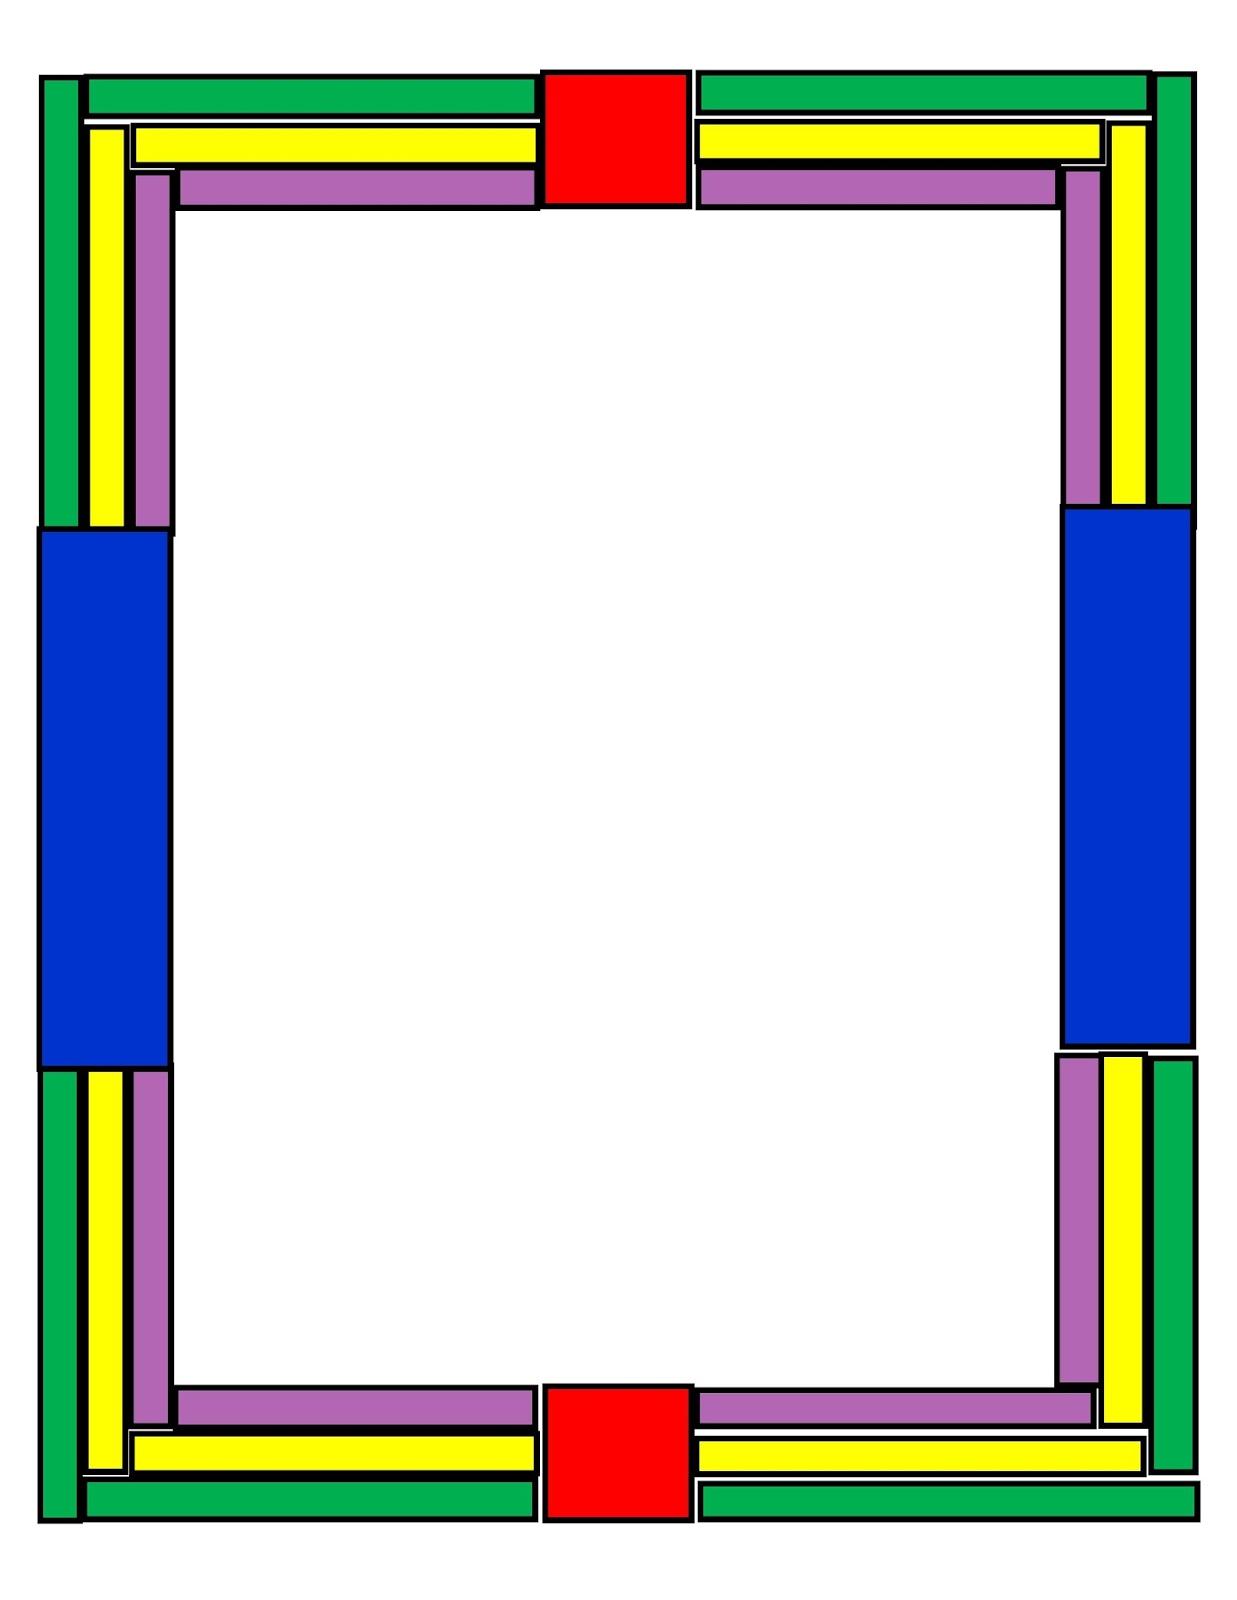 Algebra\'s Friend: Digital Frames - Exploring Color